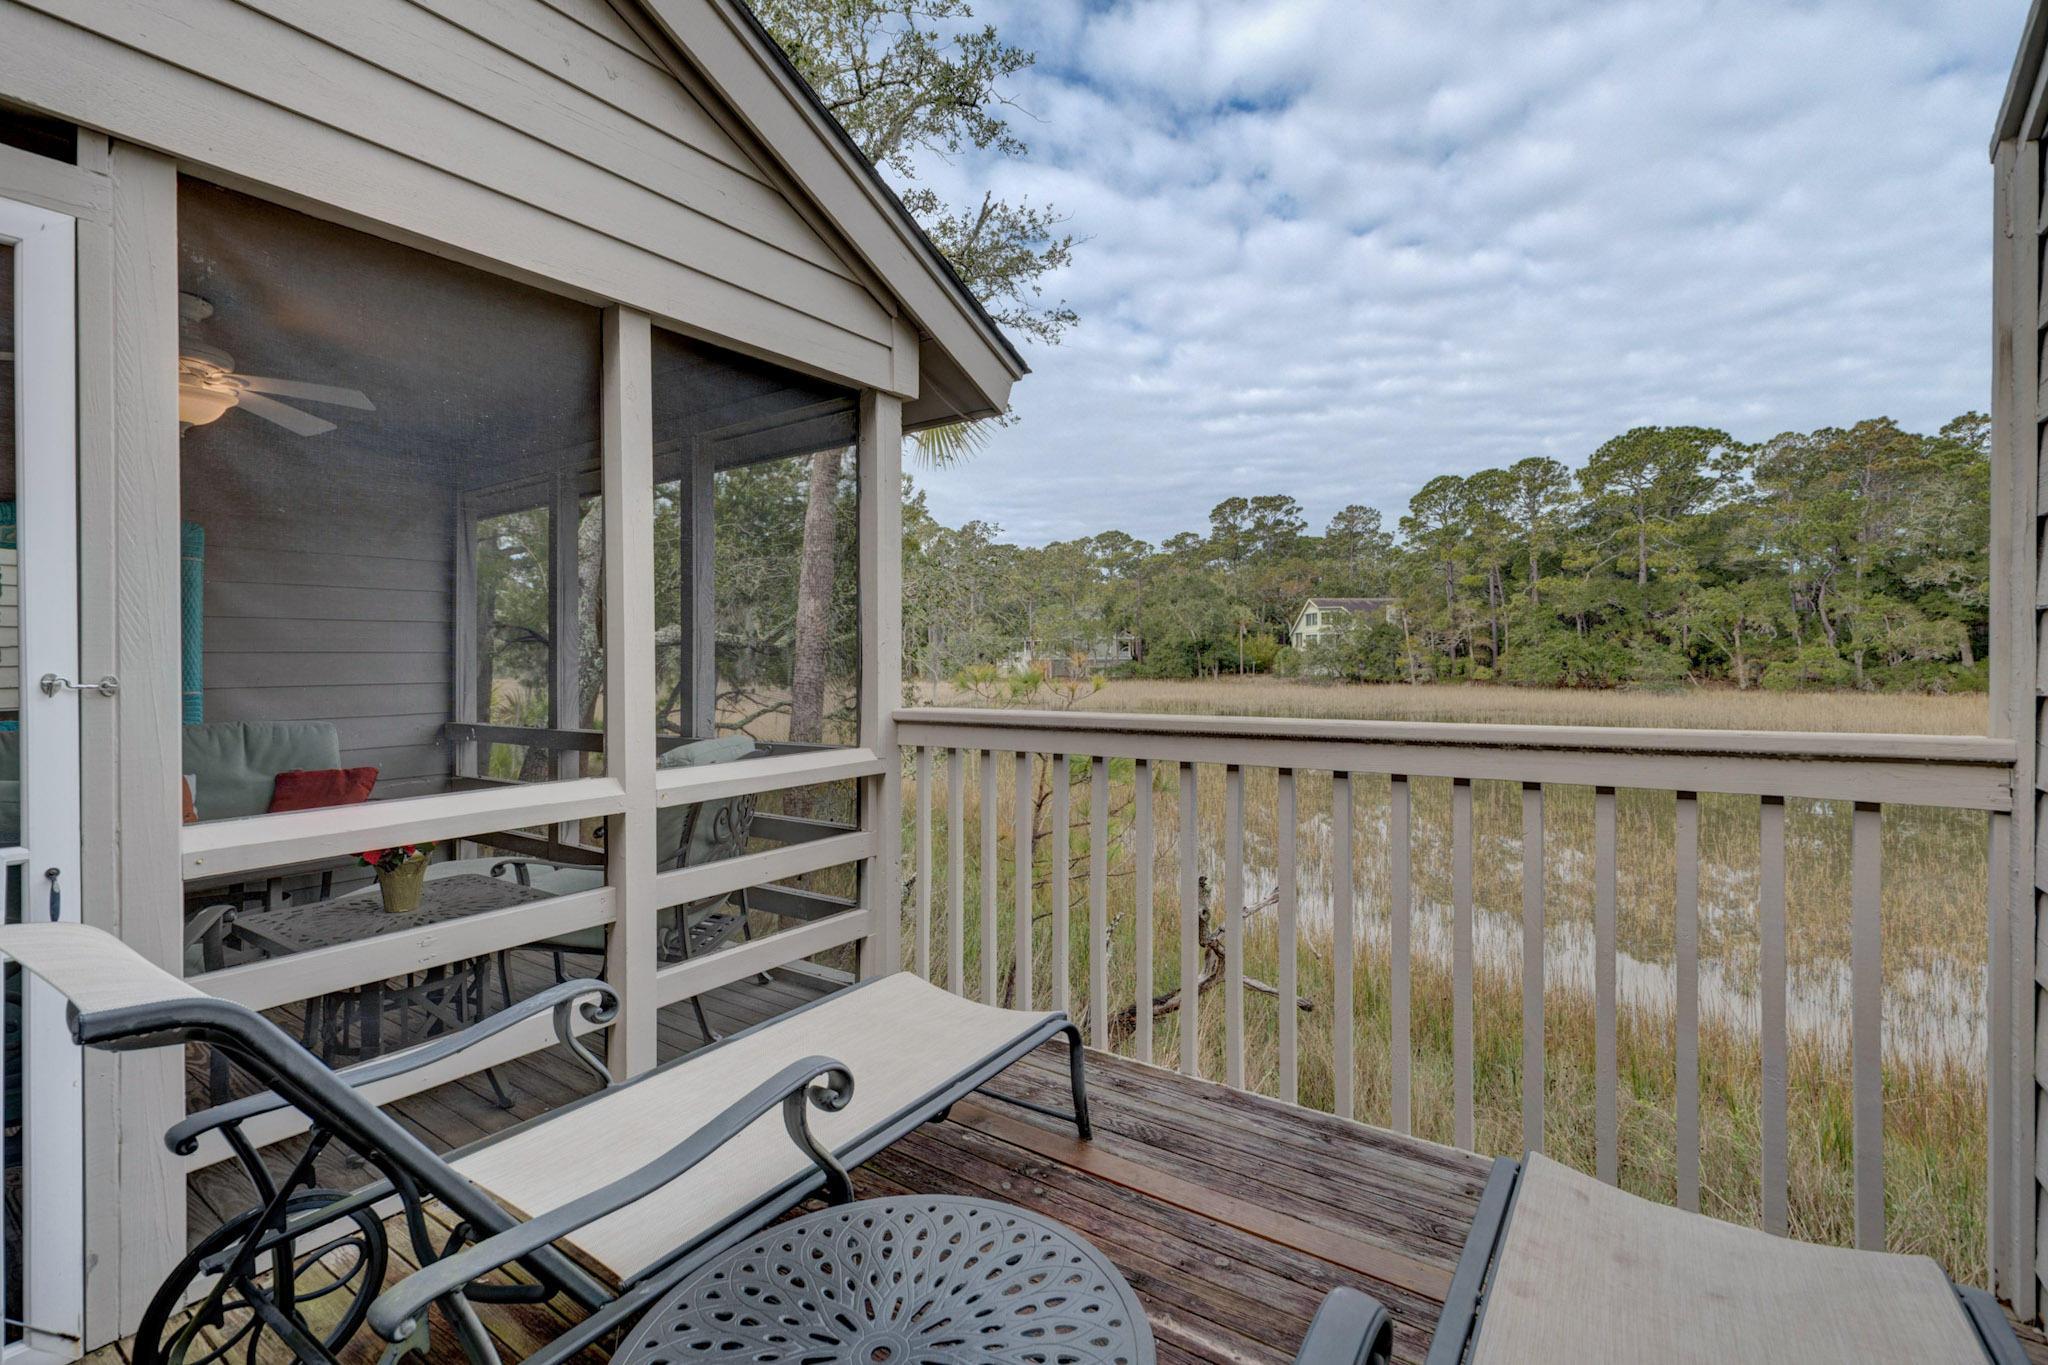 Creek Watch Villas Homes For Sale - 1244 Creek Watch, Johns Island, SC - 20